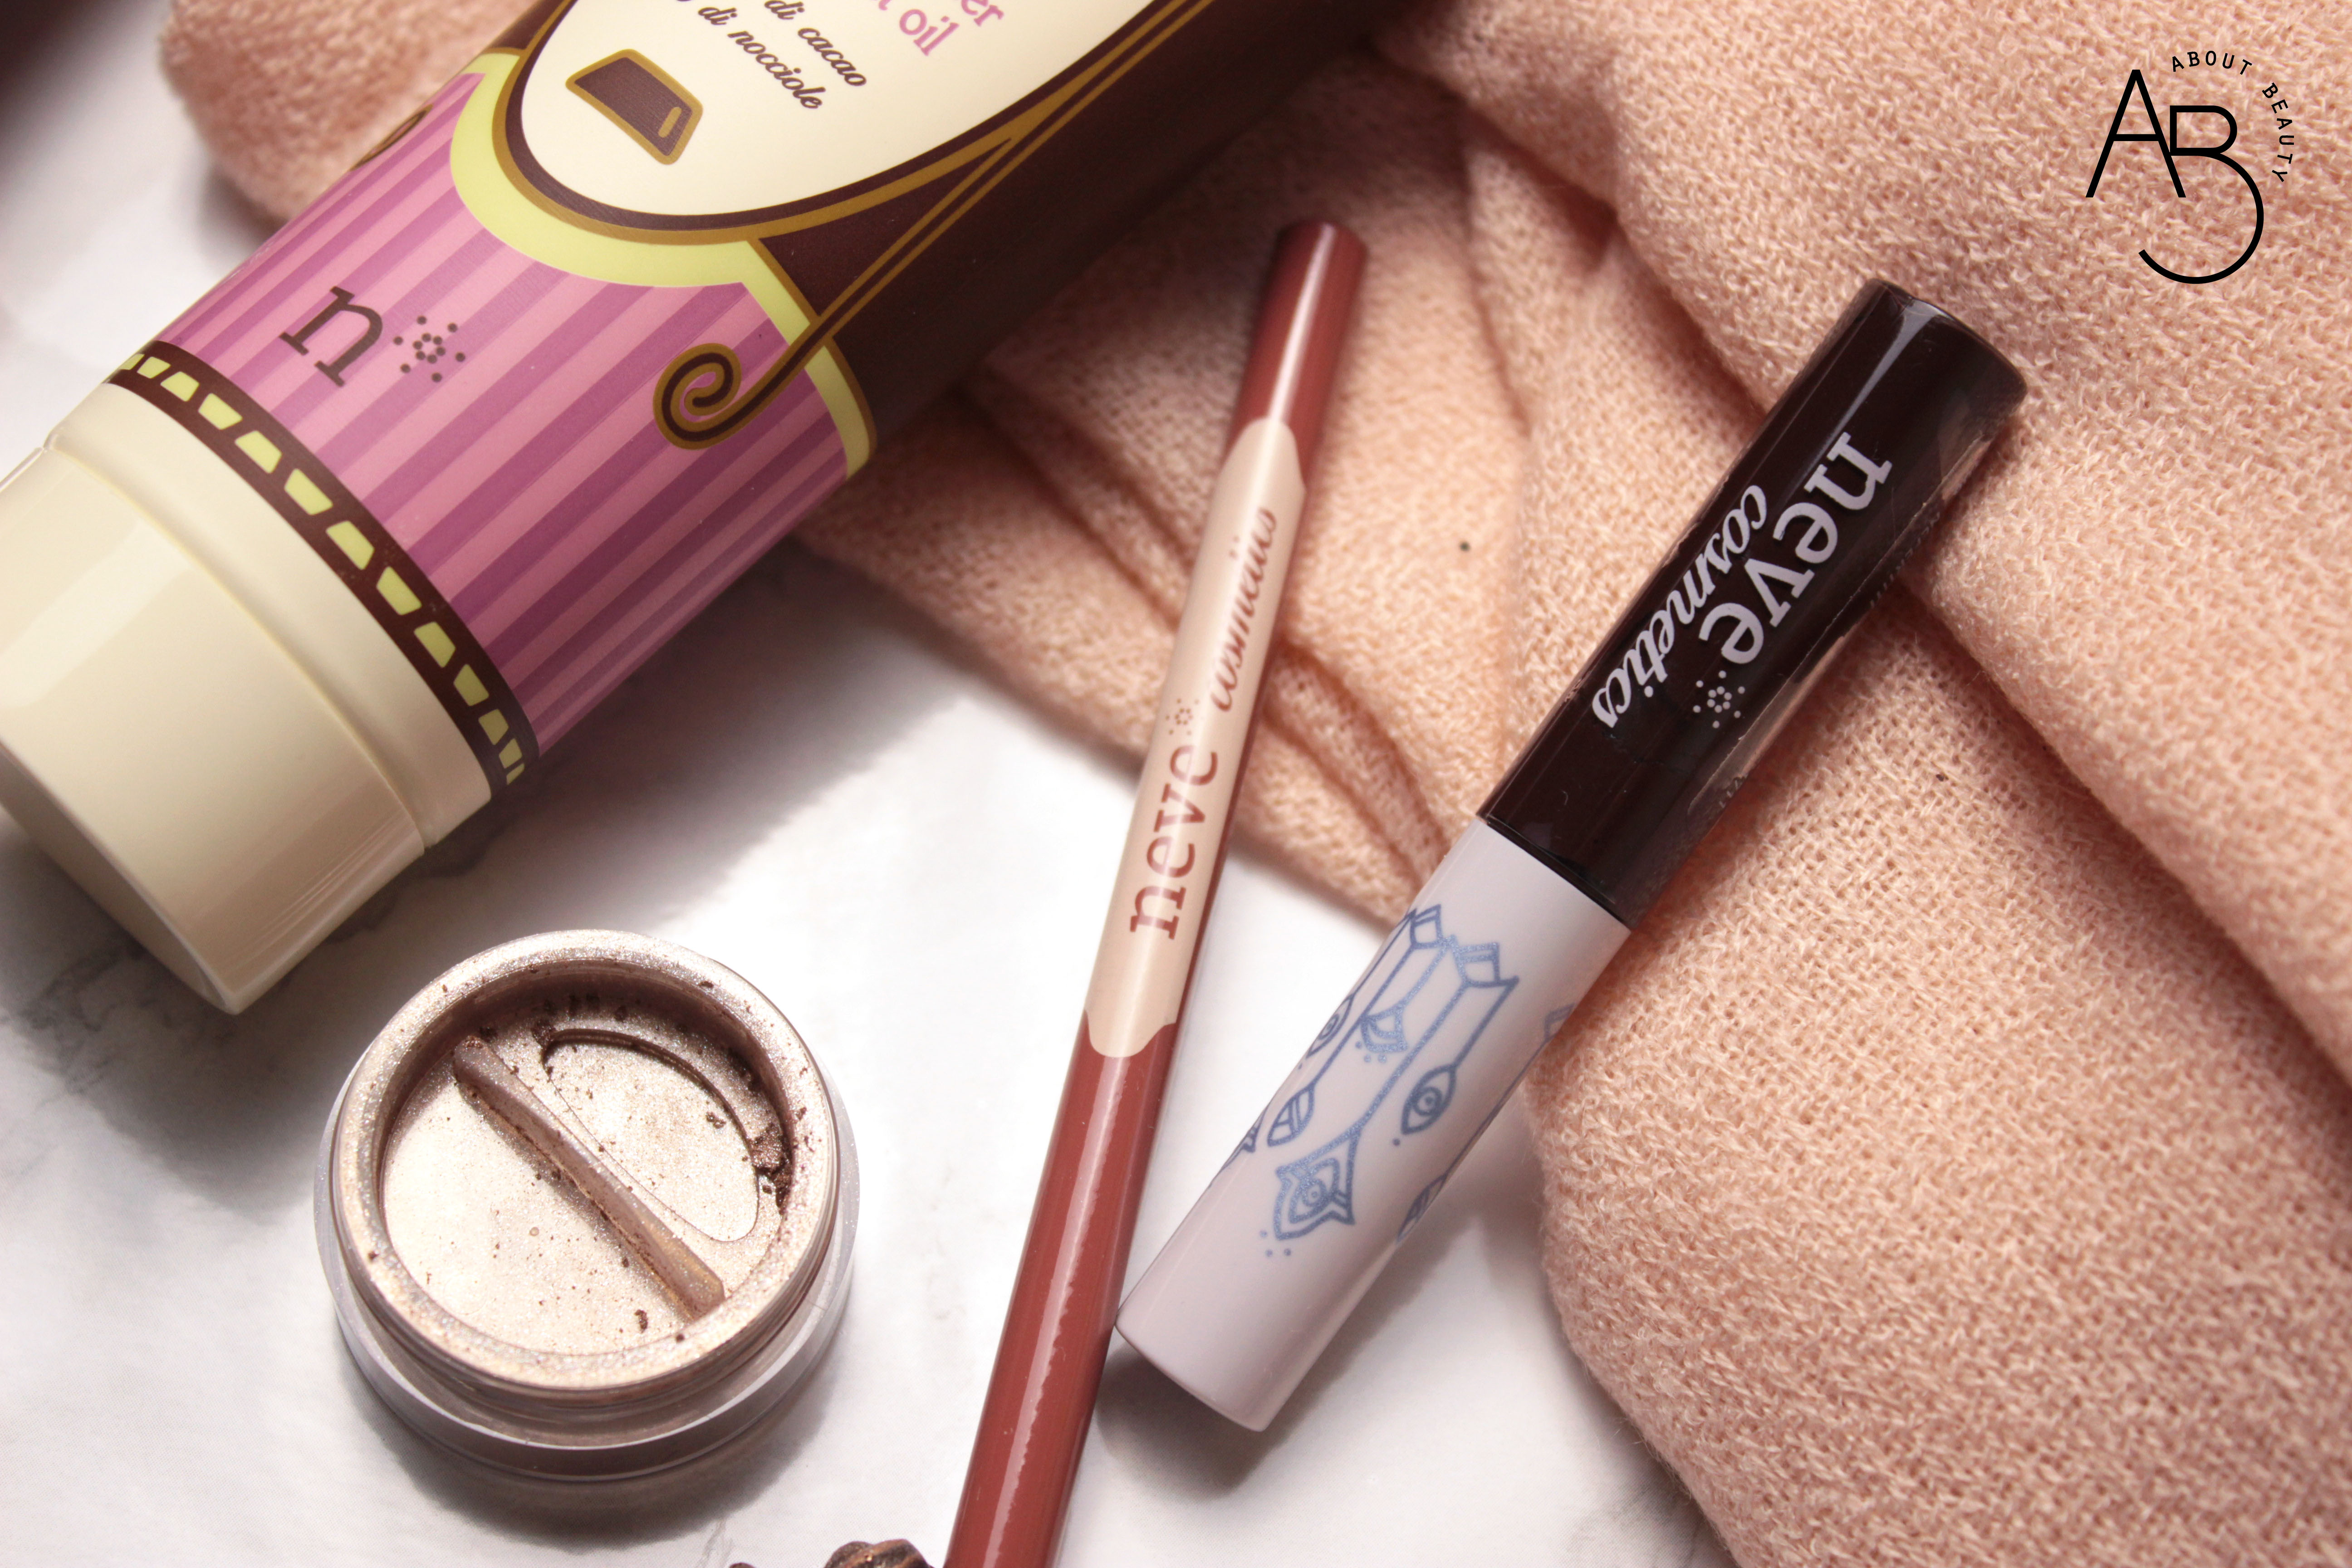 Doccia gianduiosa Neve Cosmetics - Review, recensione, info, prezzo, dove acquistare - Chocolate Valentine Promo - Inkme eyeliner